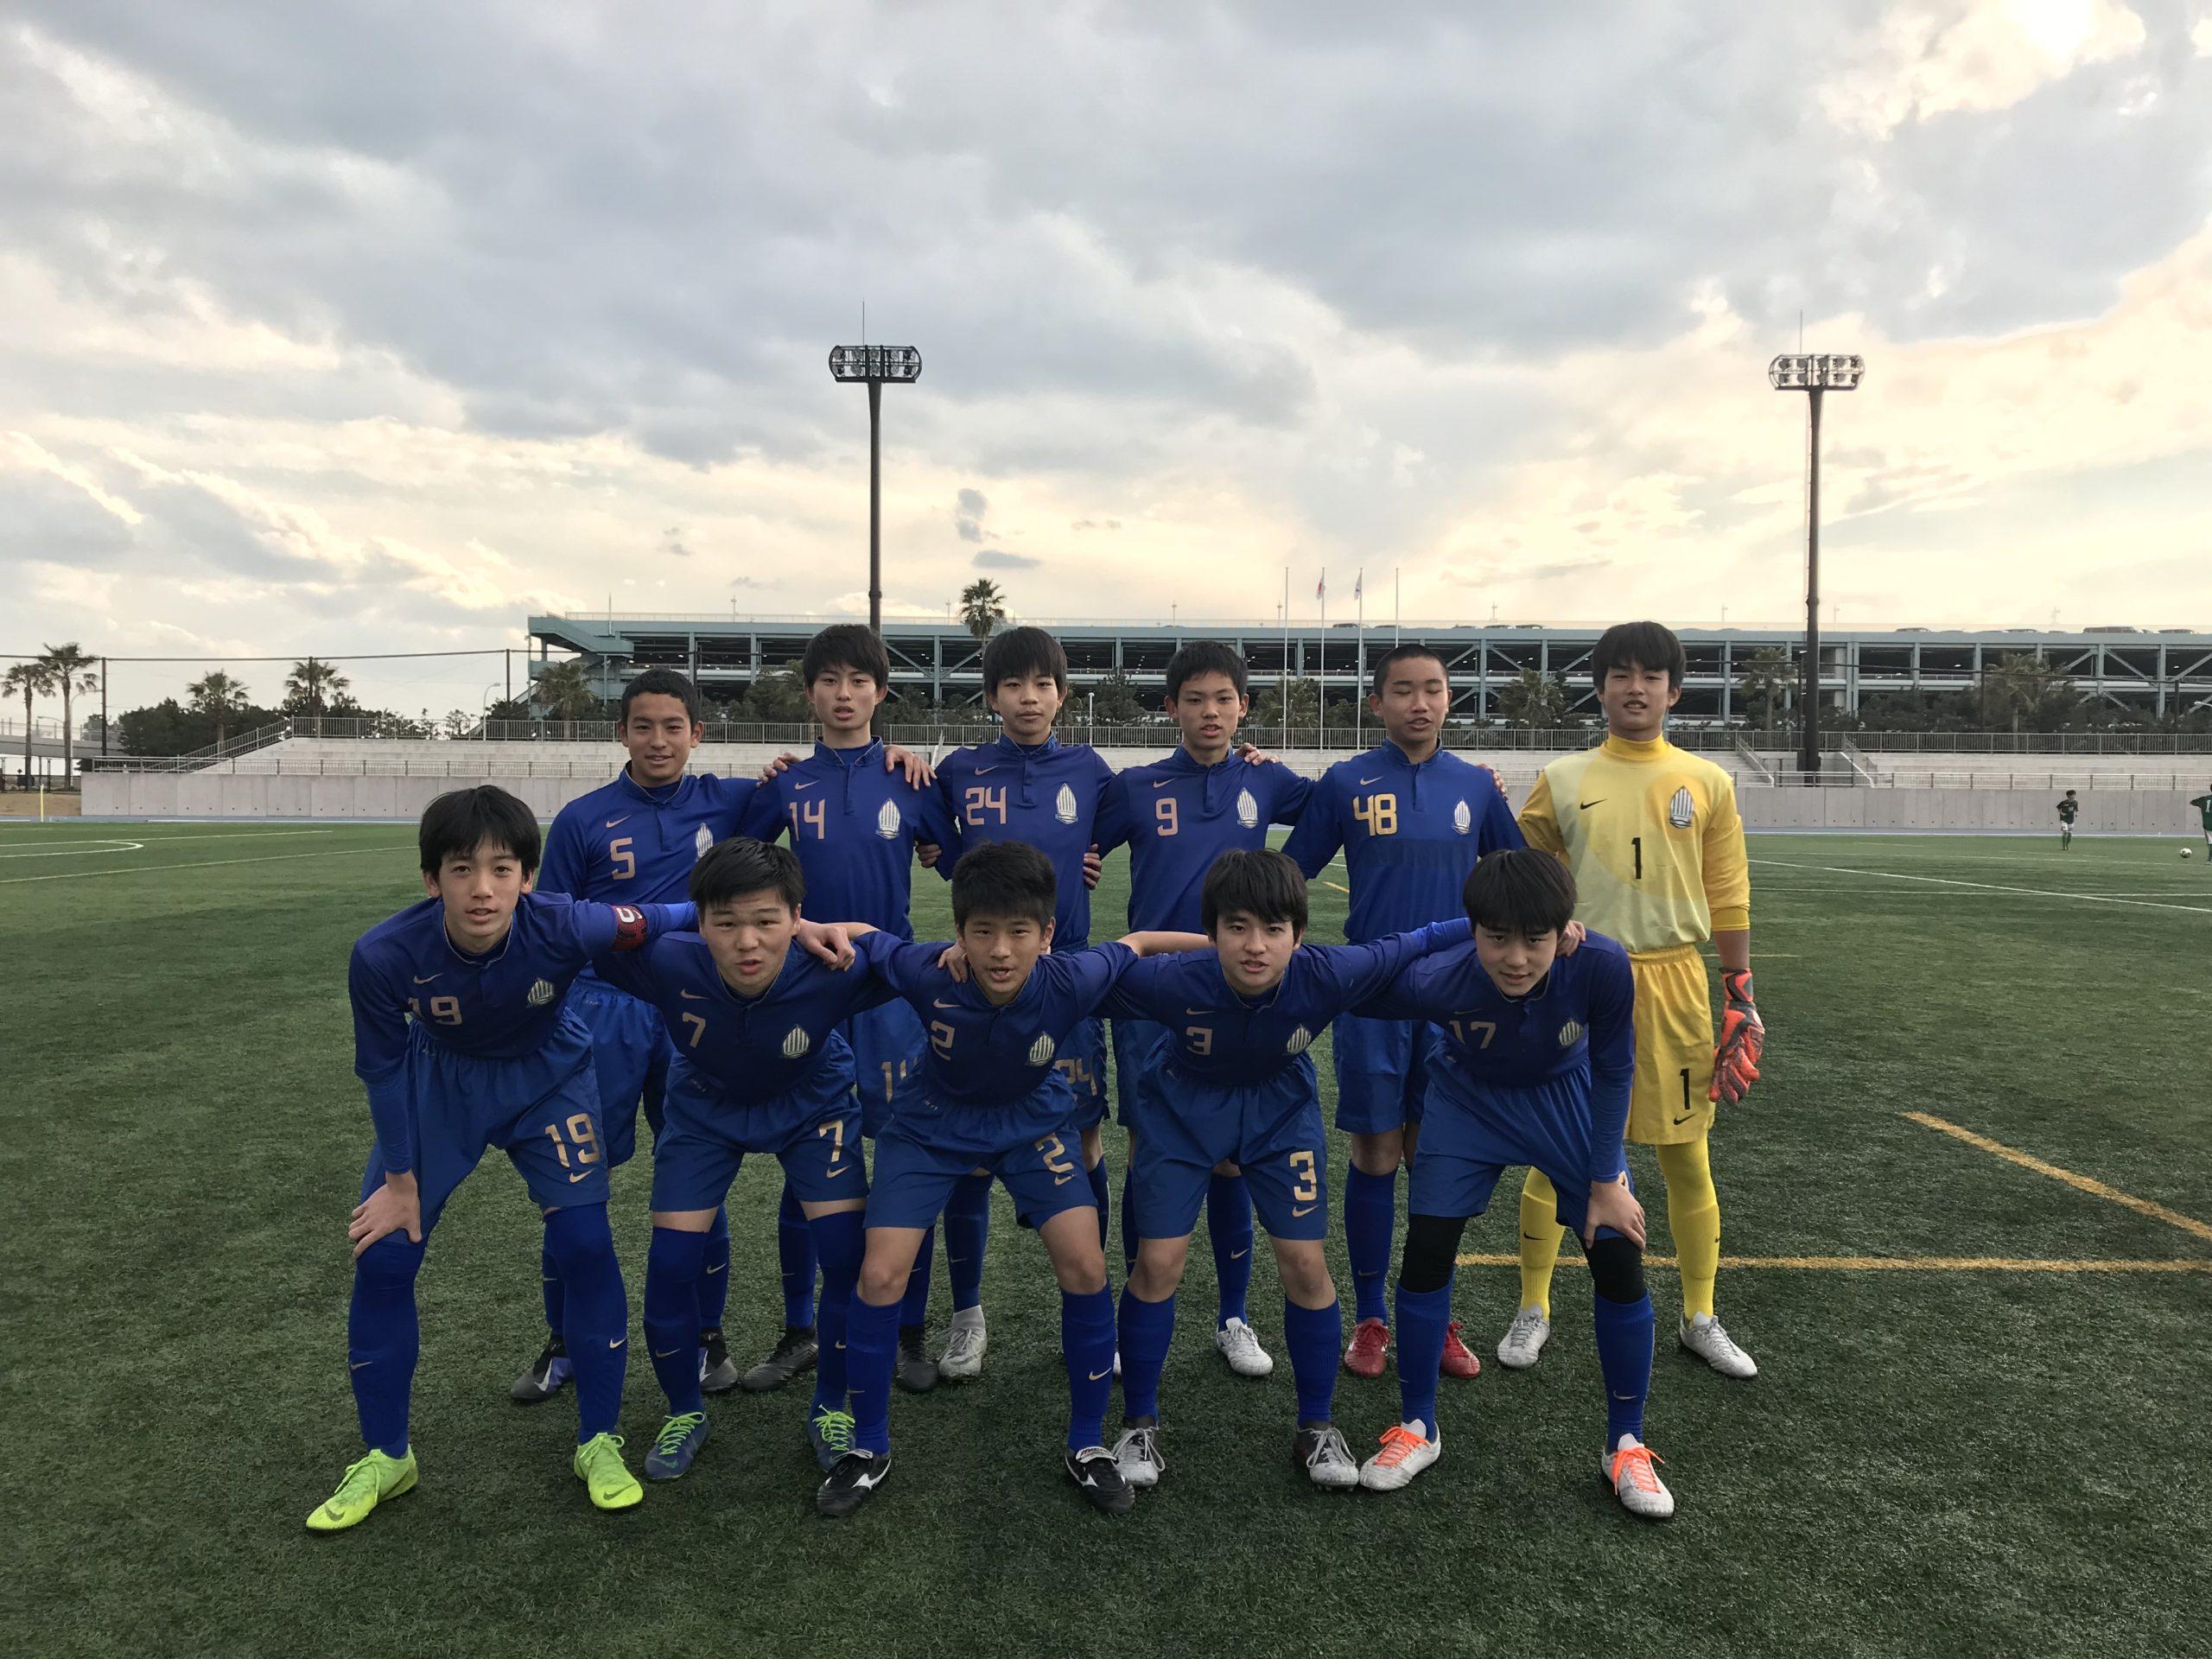 【U15】高円宮杯 U-15サッカー千葉県1部リーグ 第6節